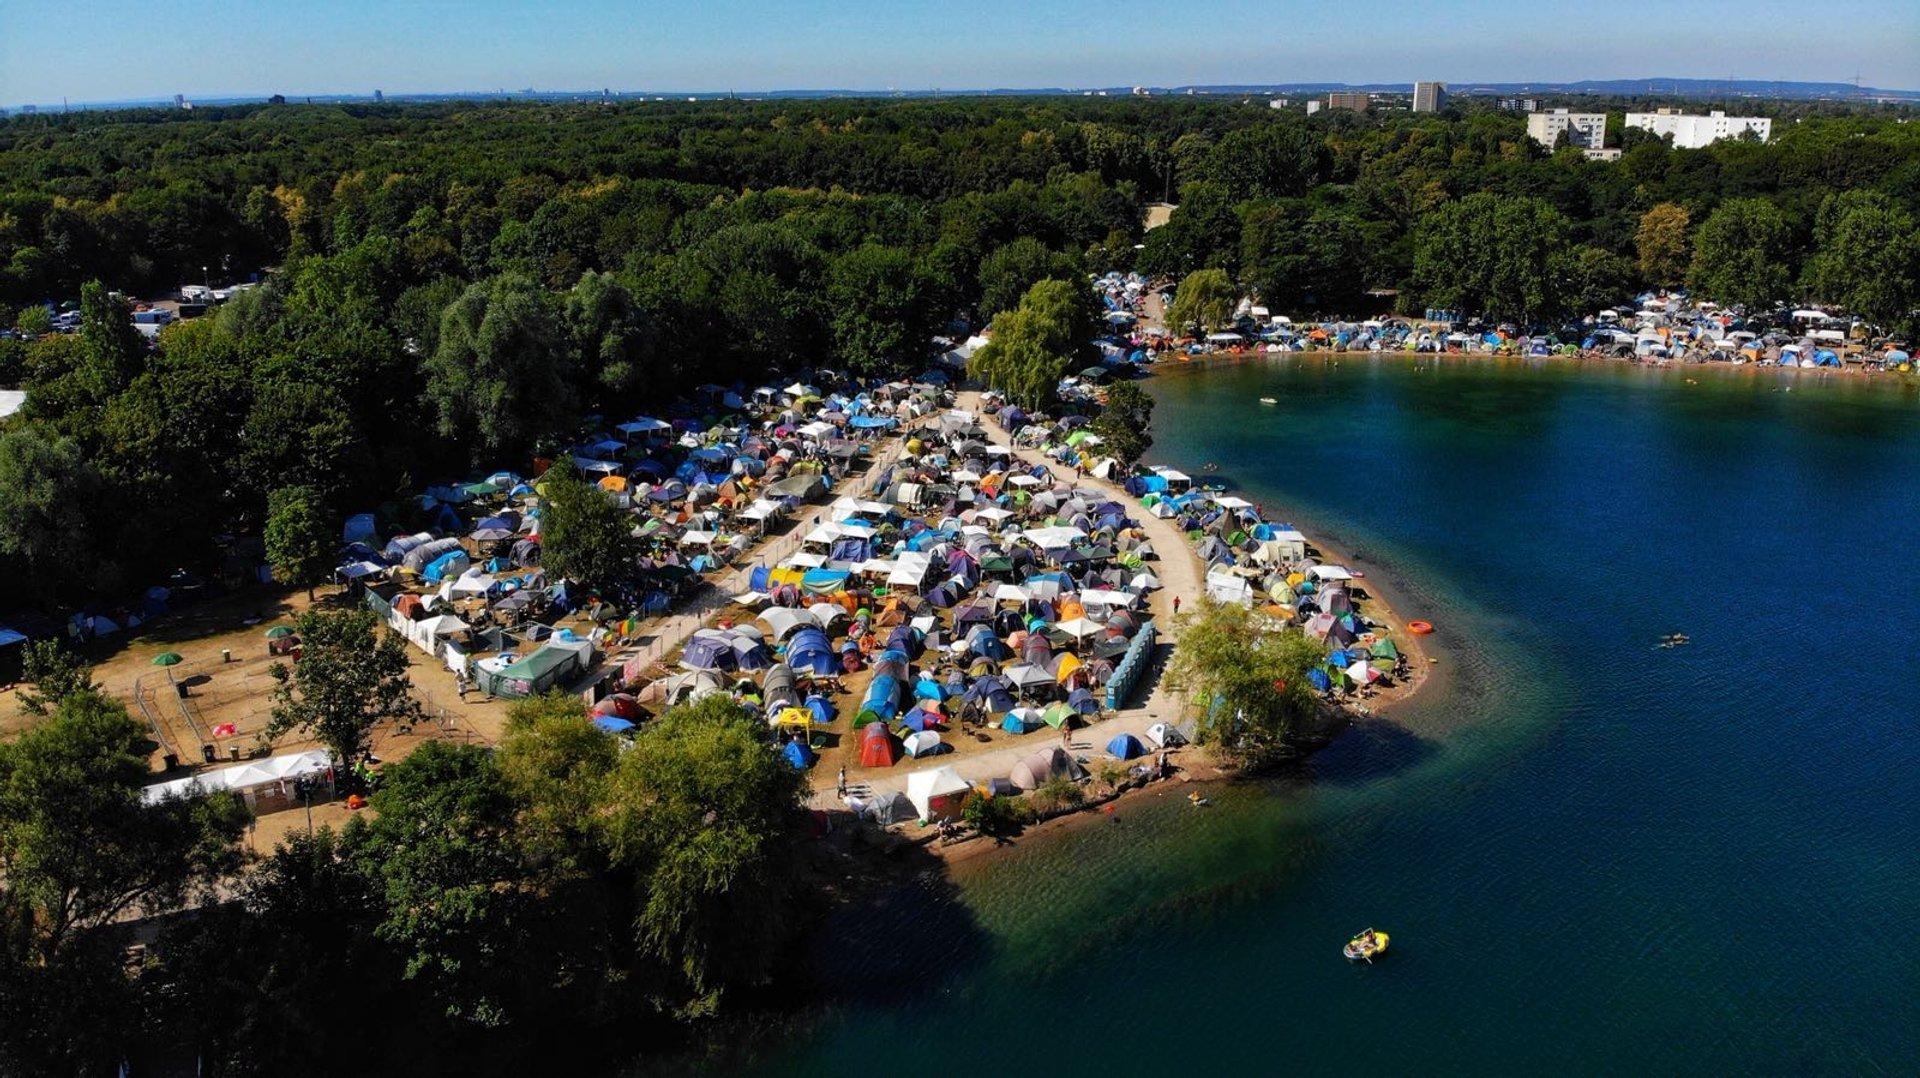 When Is Summer Jam 2020.Summerjam Festival 2020 In Germany Dates Map